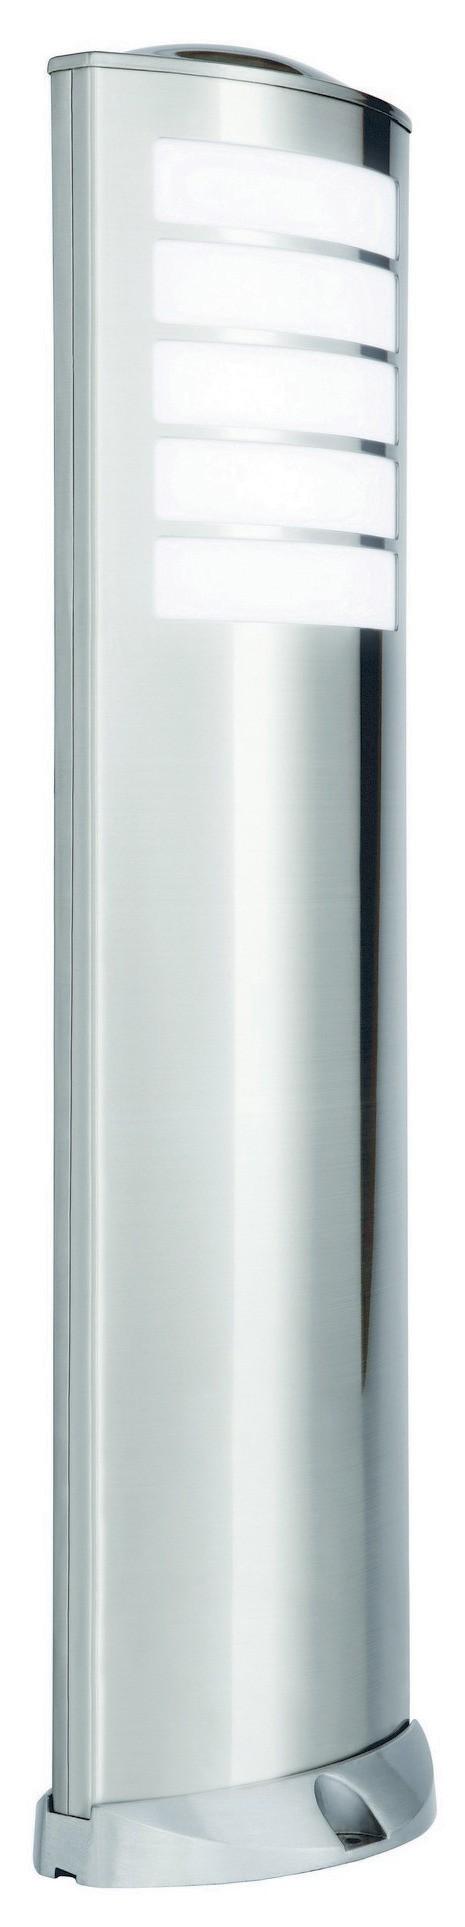 lighting australia queenslander bollard light in 304 stainless